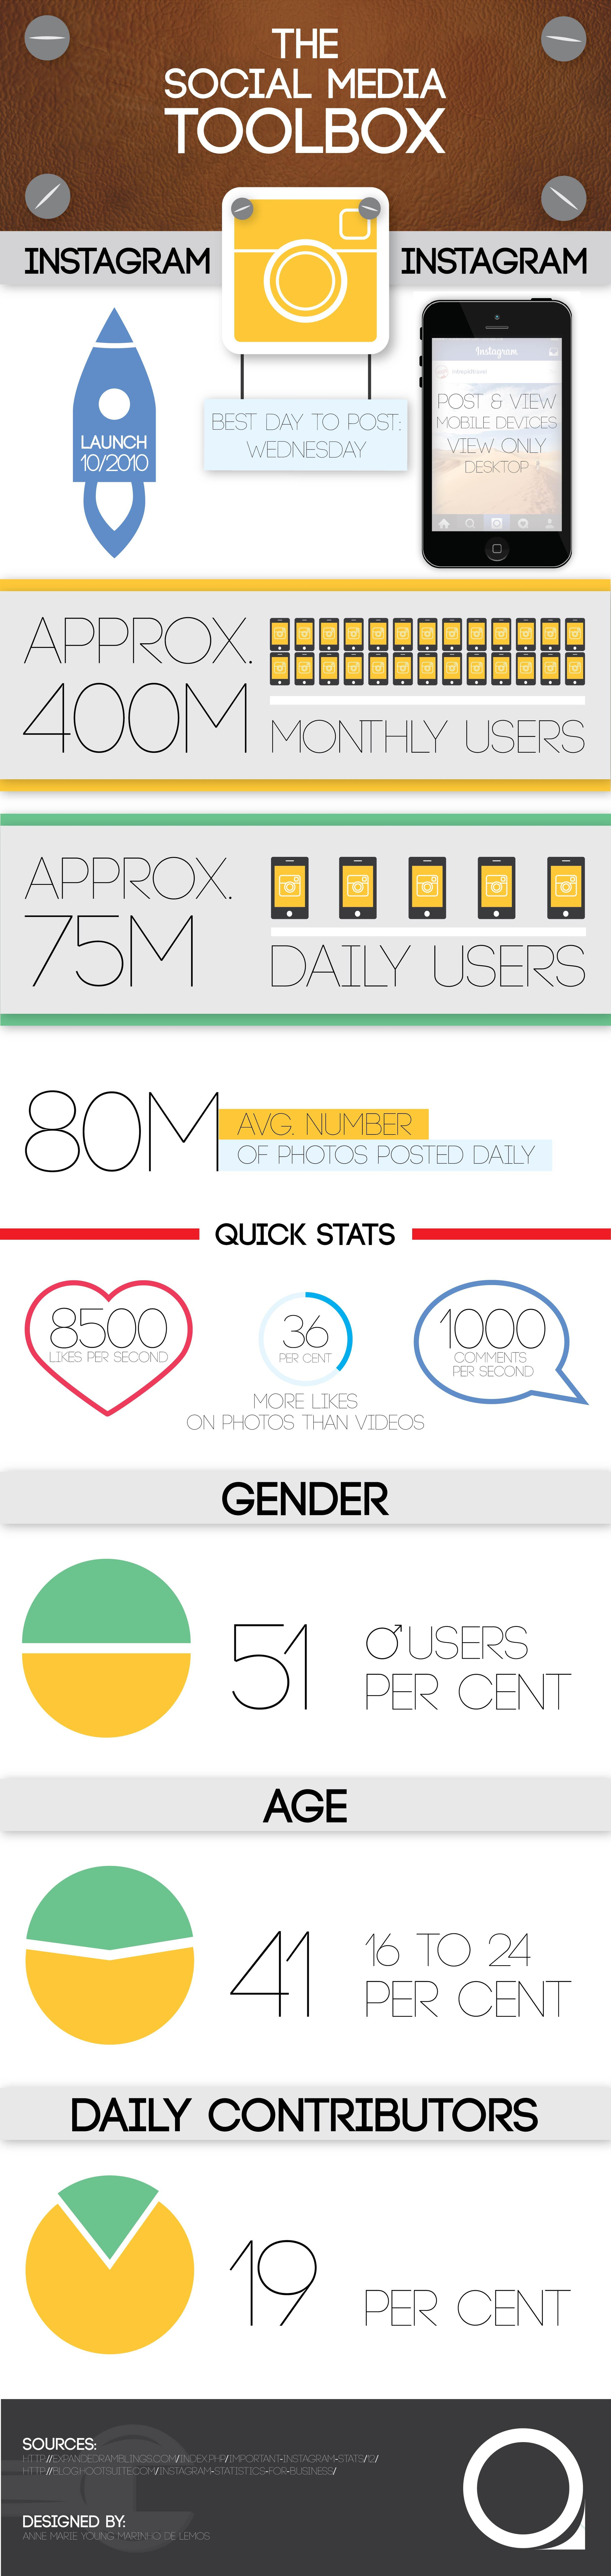 Instagram infographic on user behaviour